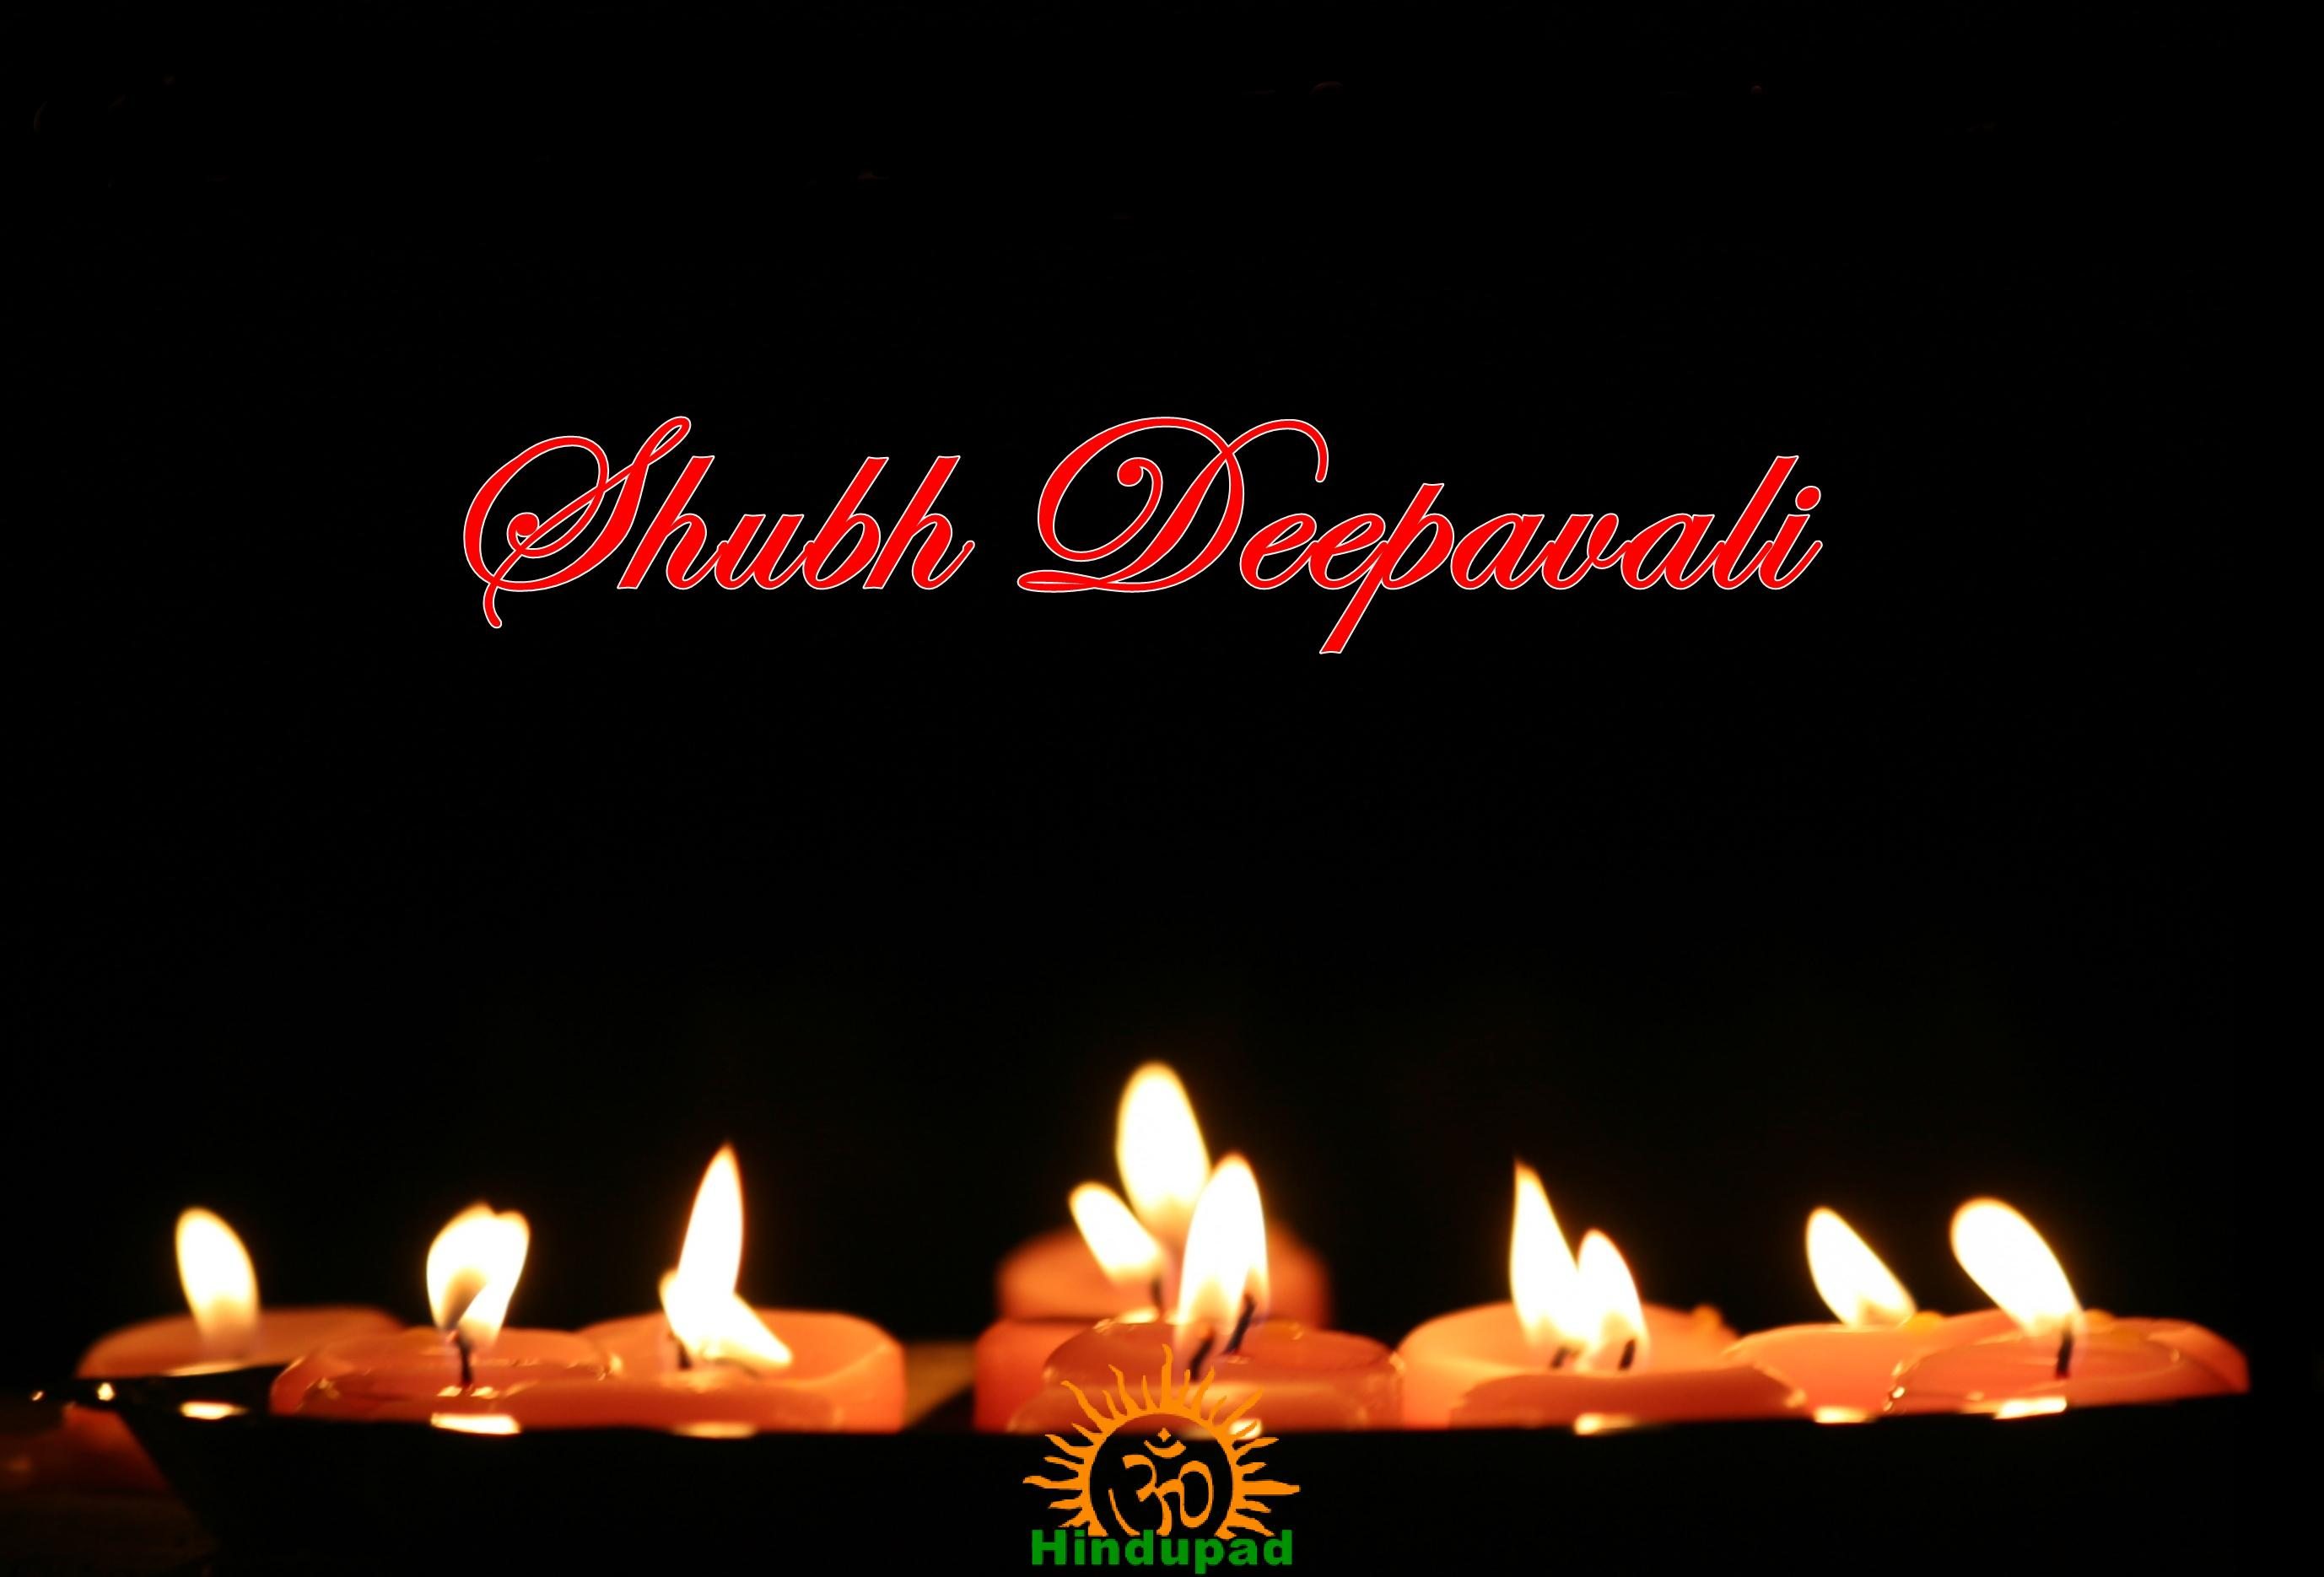 Diwali Wallpapers Desktop Calendars Deepavali Greetings Cards